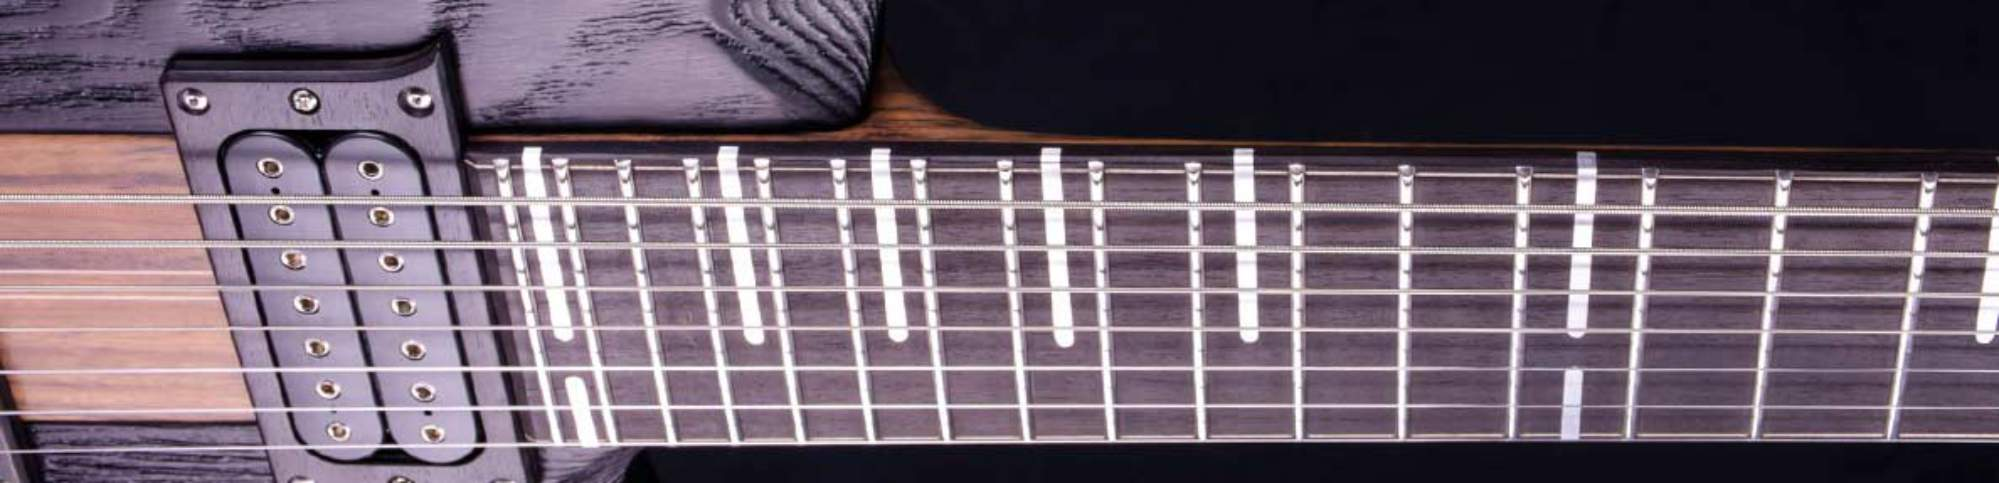 7-String Gitarre | Cyan Custom Guitars